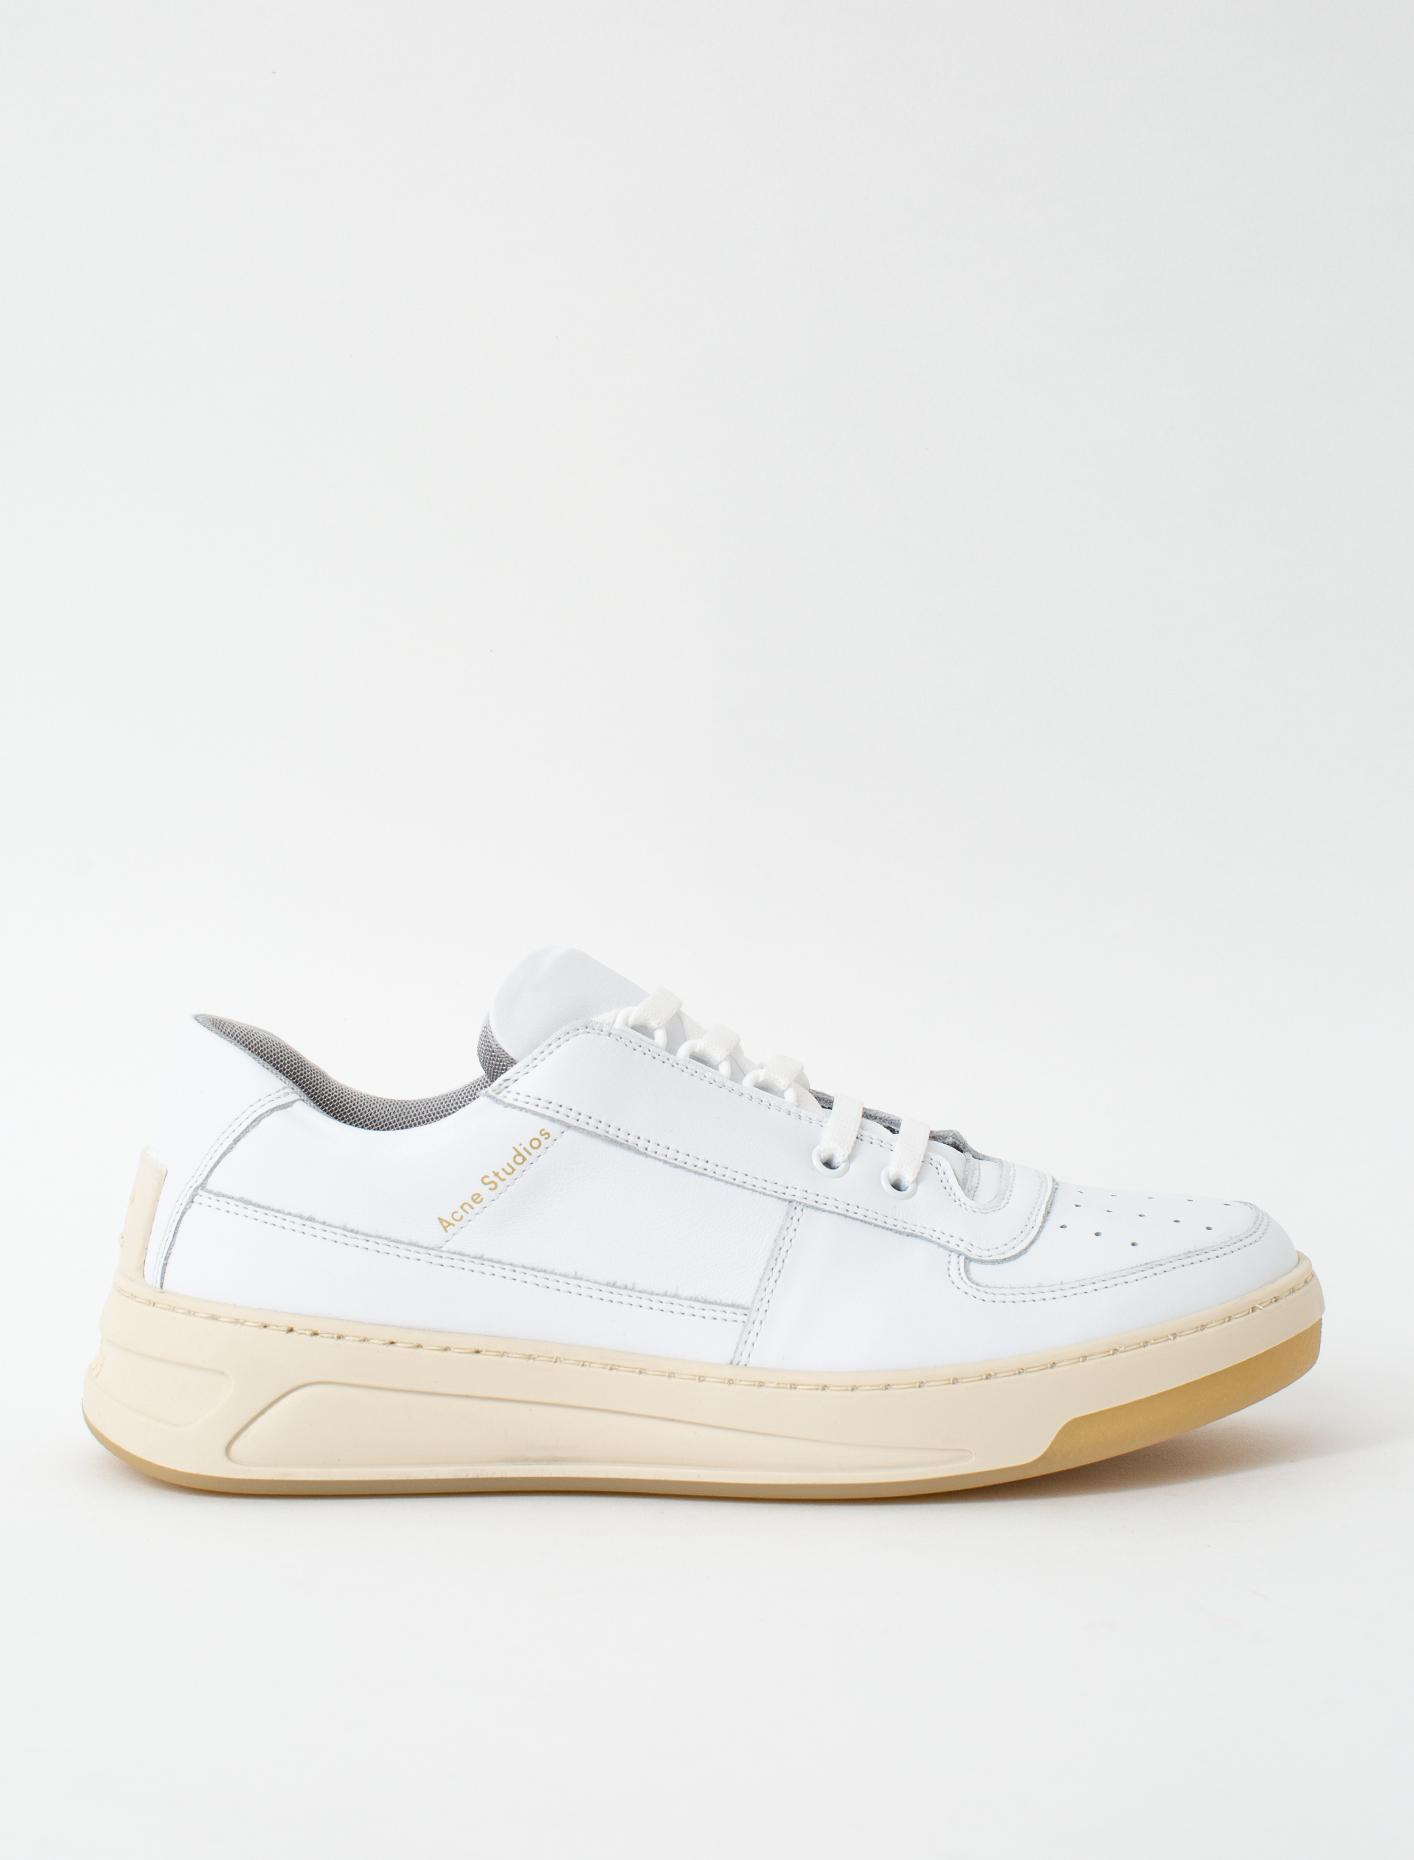 Acne Studios Perey Lace Up Shoe | Voo